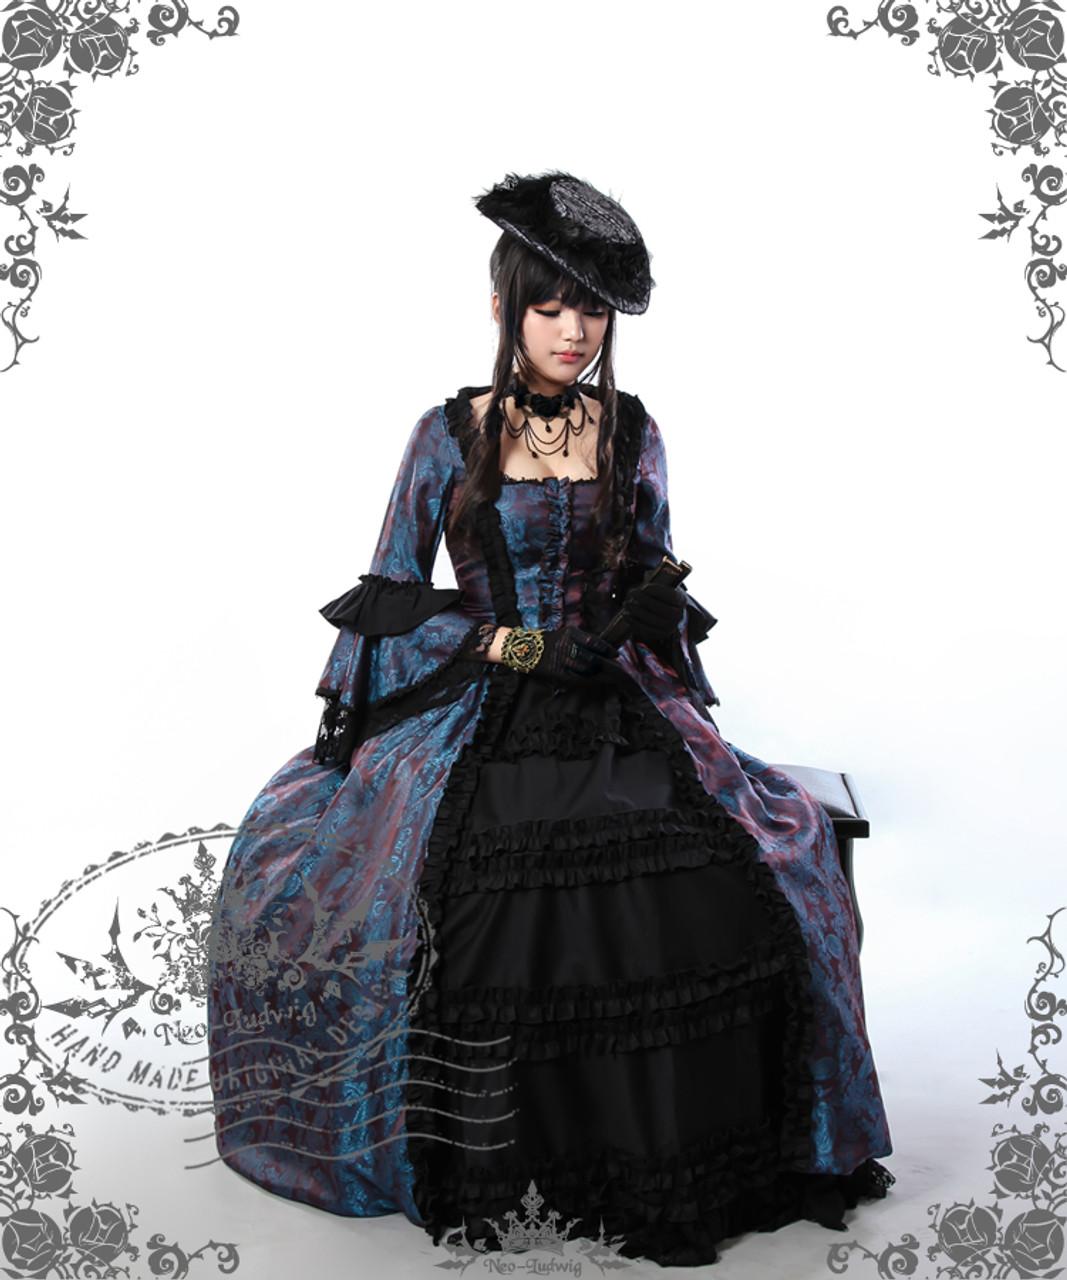 Rococo/Baroque 18th Century Clothing Renaissance Costume